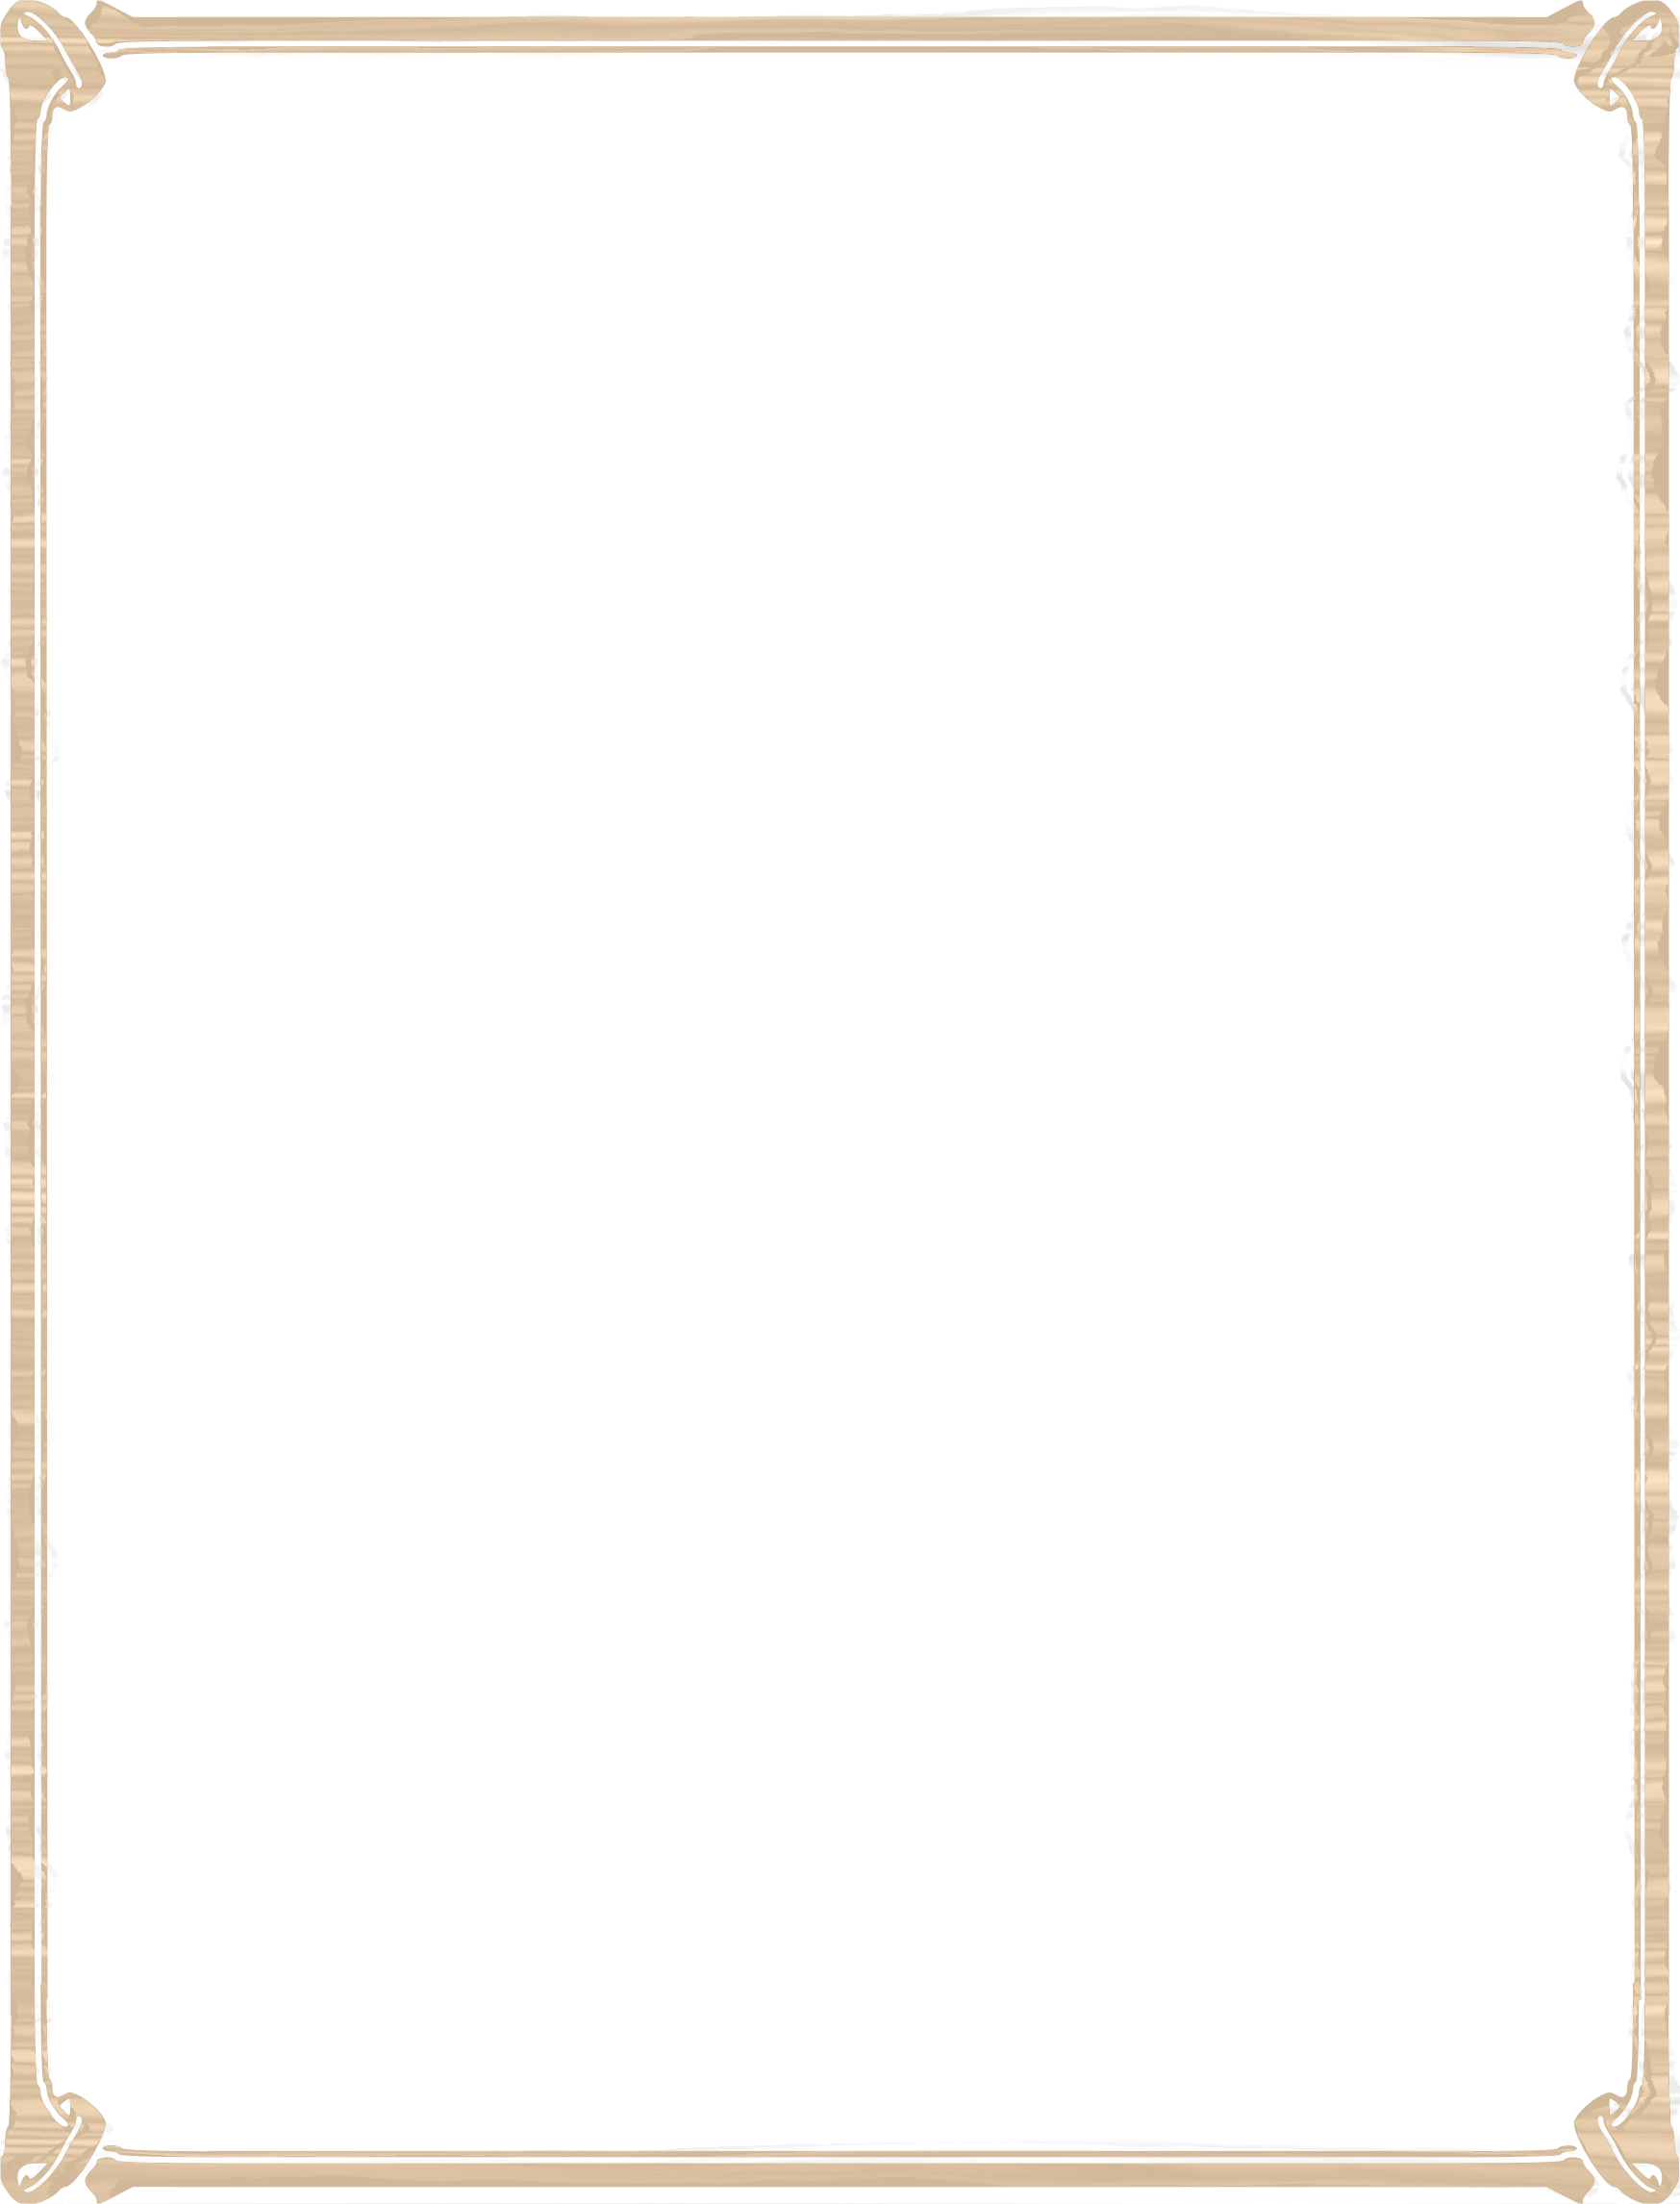 Wood border png. Clipart big image